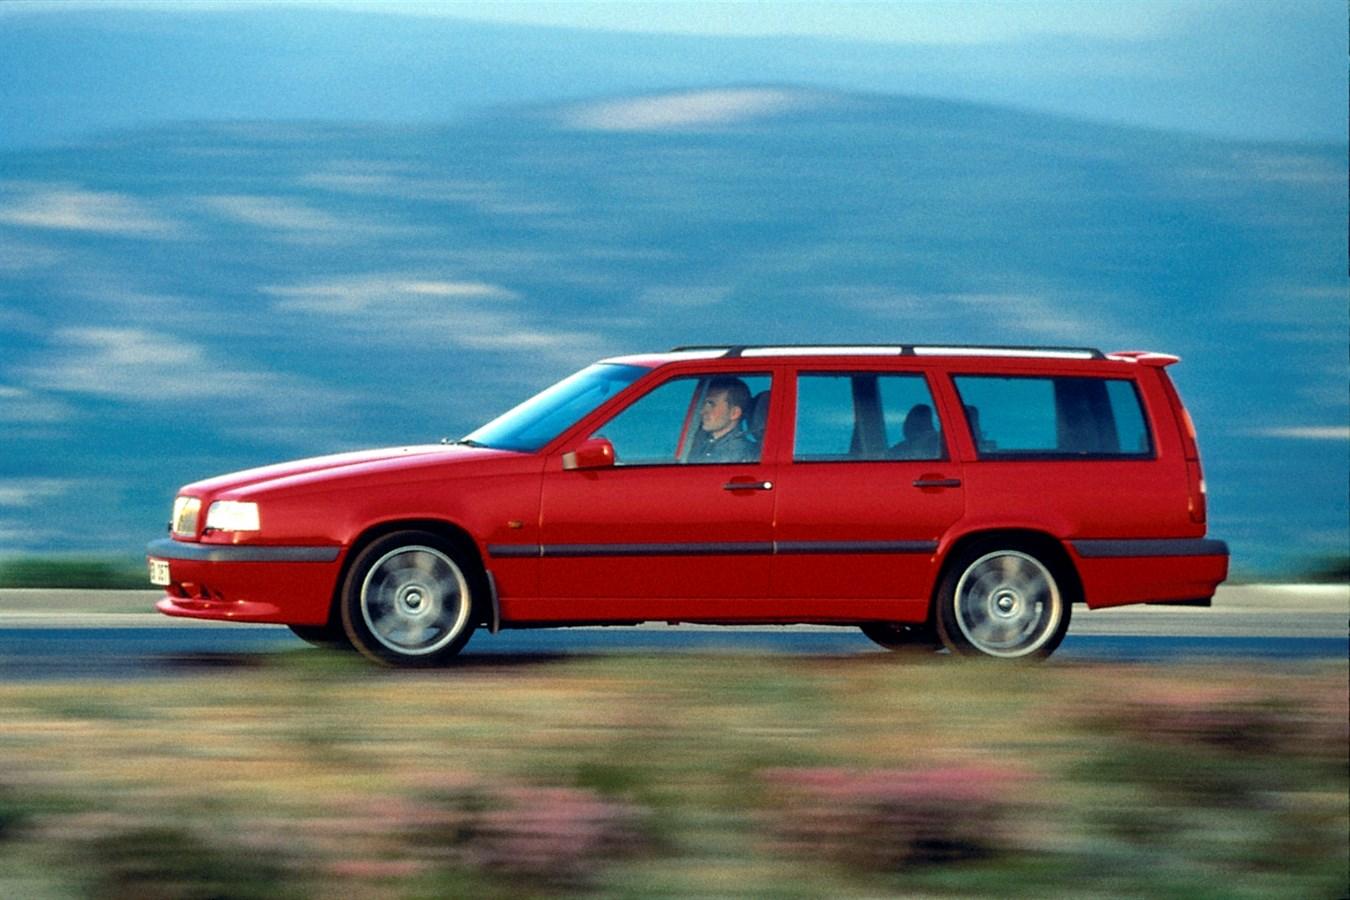 VOLVO 850 (1991-1996) - Volvo Car USA Newsroom